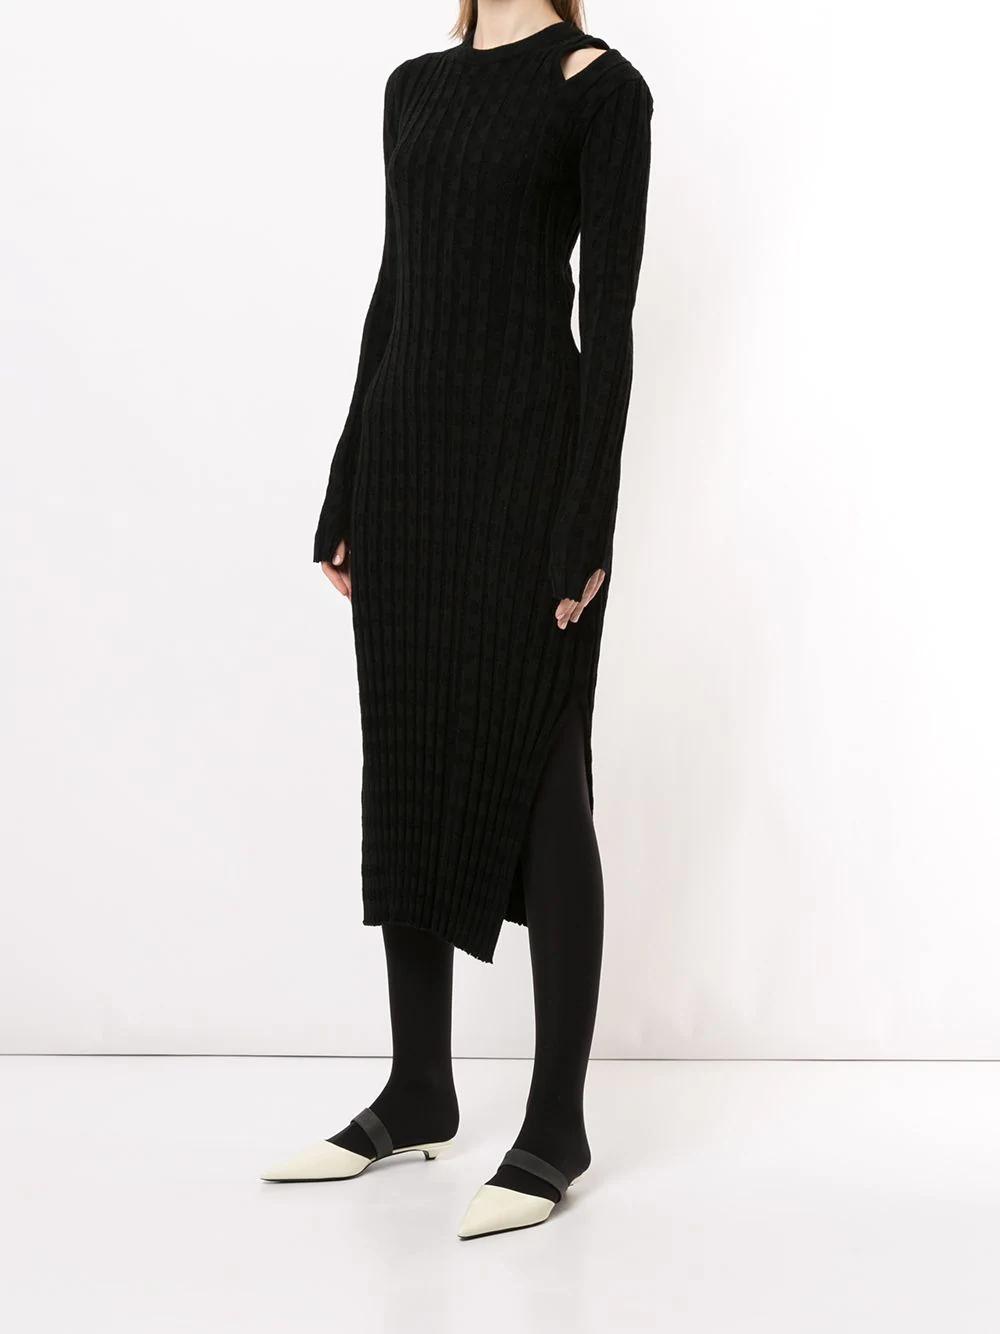 Proenza Schouler White Label Velvet Checkerboard Ribbed Dress 908лв